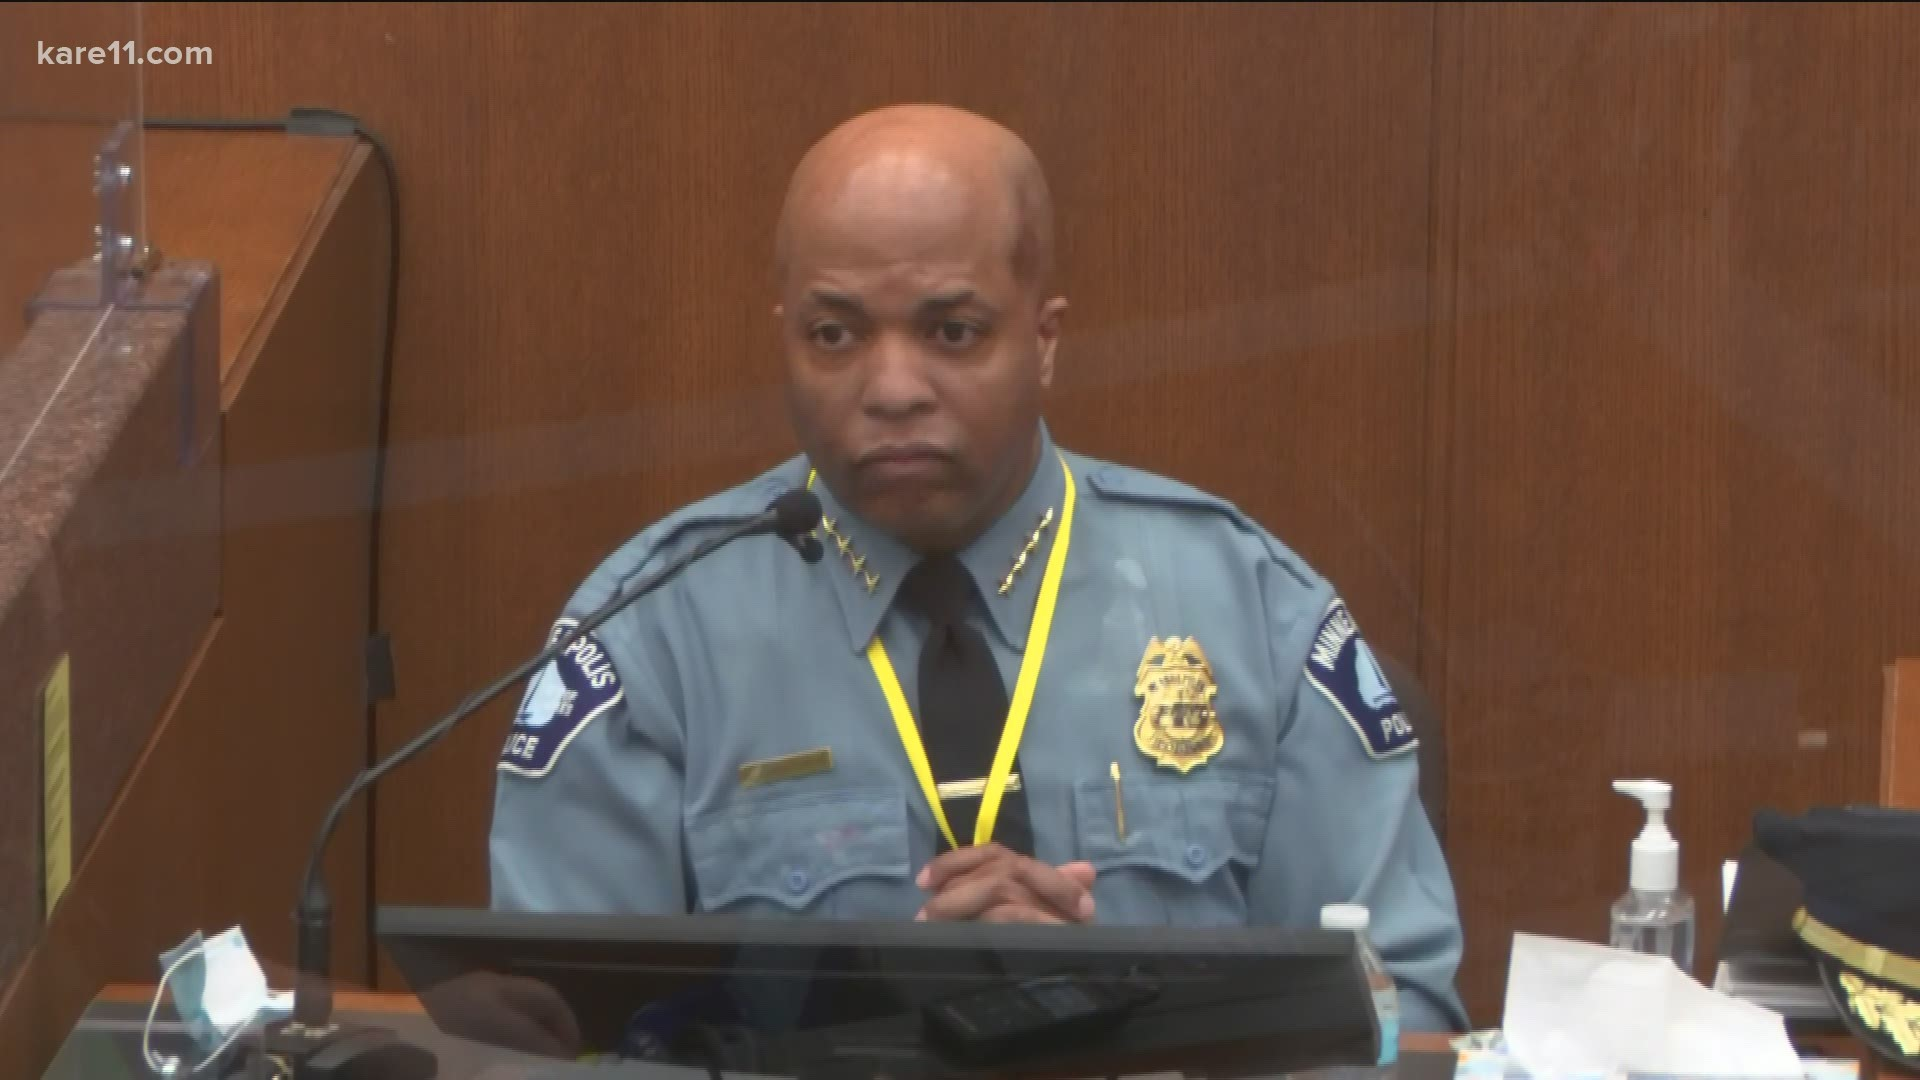 Chief Medaria Arradondo testifies in Derek Chauvin trial | wgrz.com